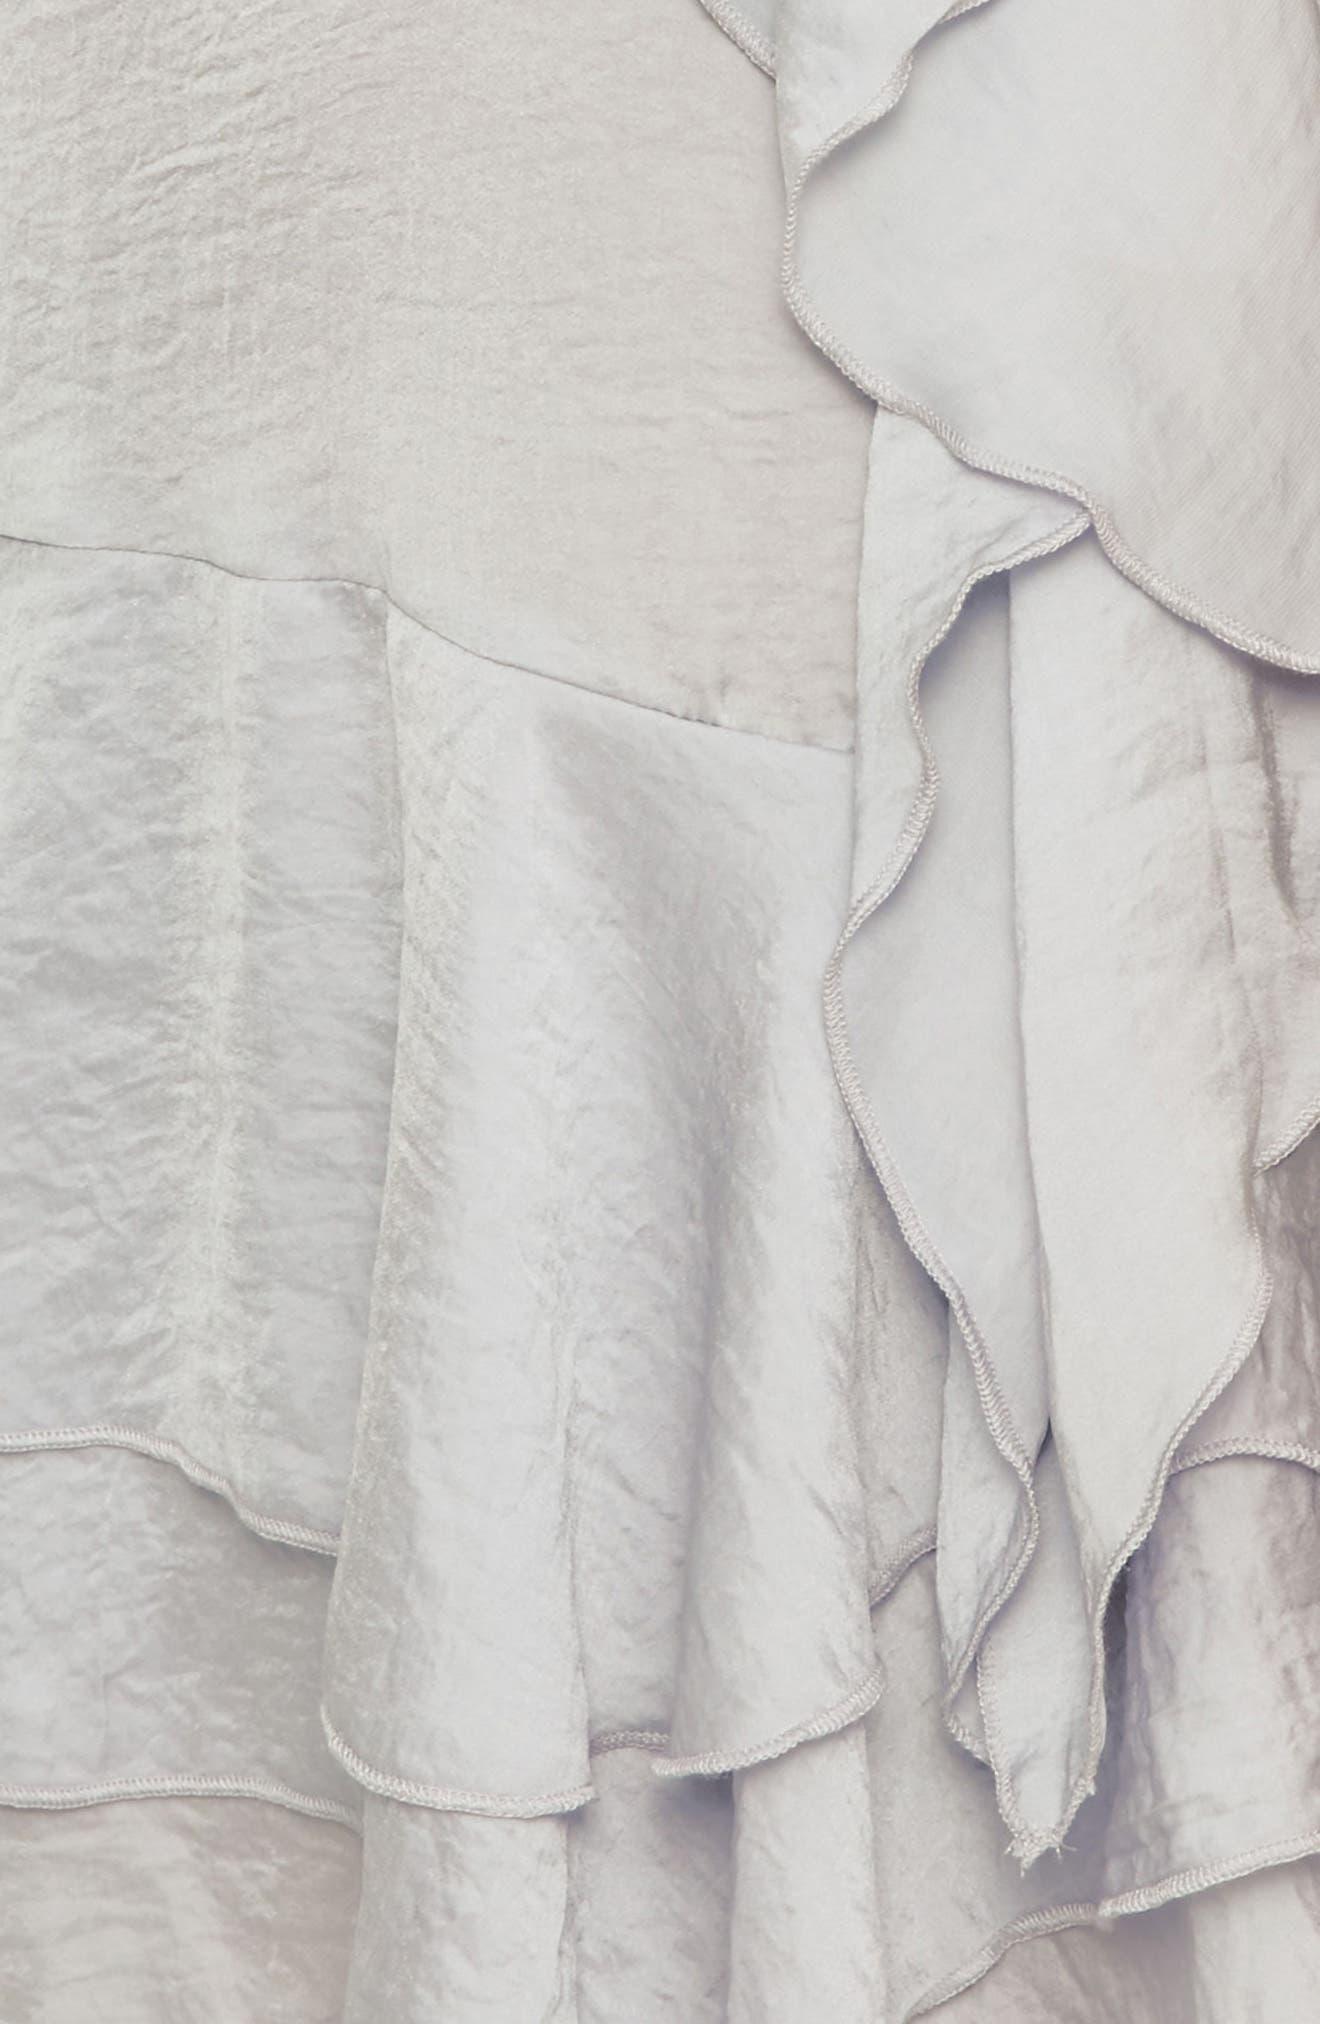 Layered Ruffle Minidress,                             Alternate thumbnail 4, color,                             060